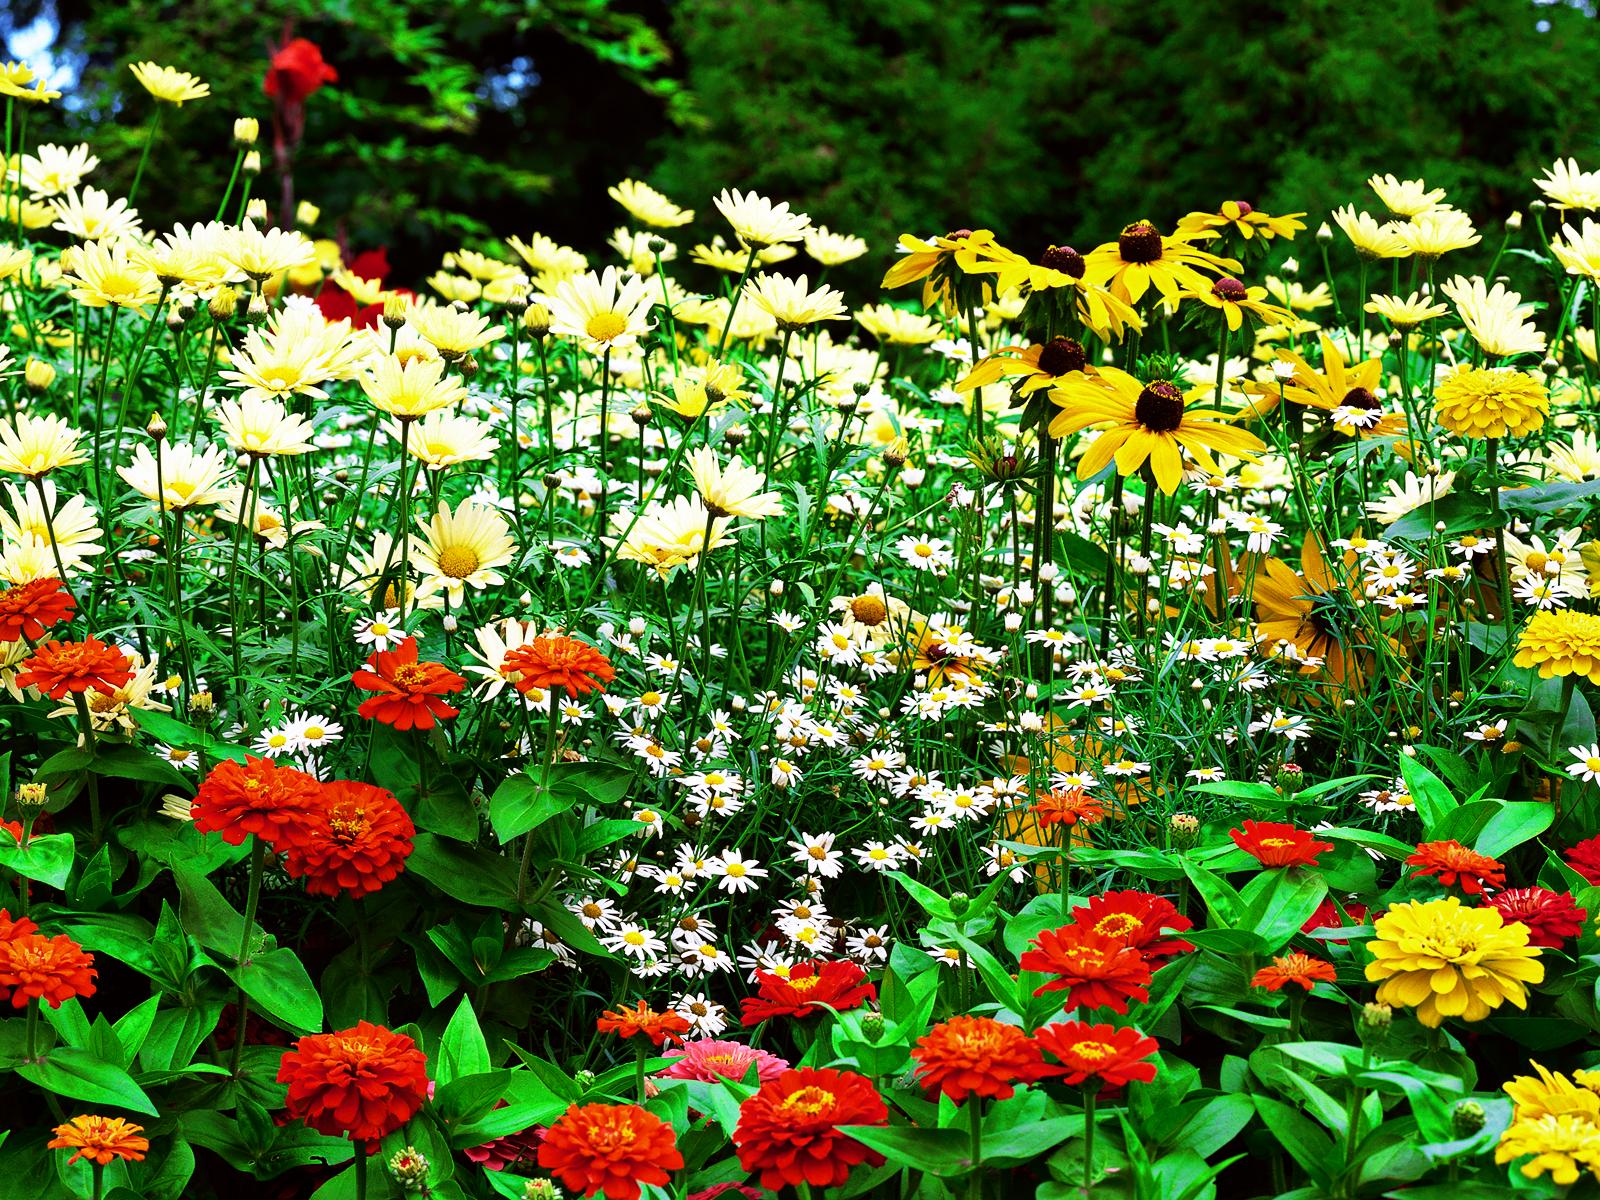 Flower Garden Wallpaper images of your flower garden wallpaper - #sc